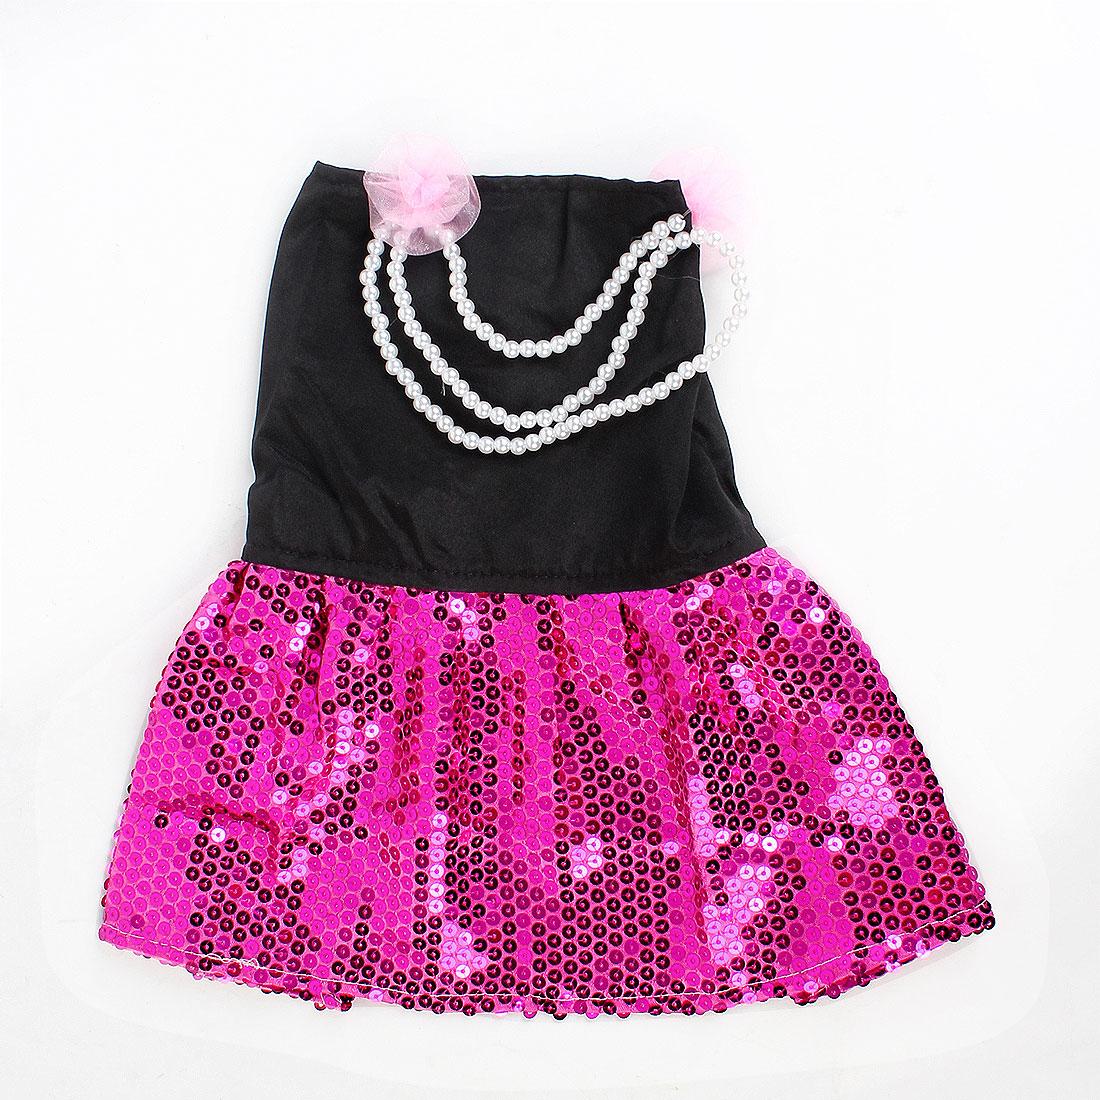 Round Beads Detail Press Stud Button Pet Dog Doggy Dress Skirt Black Fuchsia M